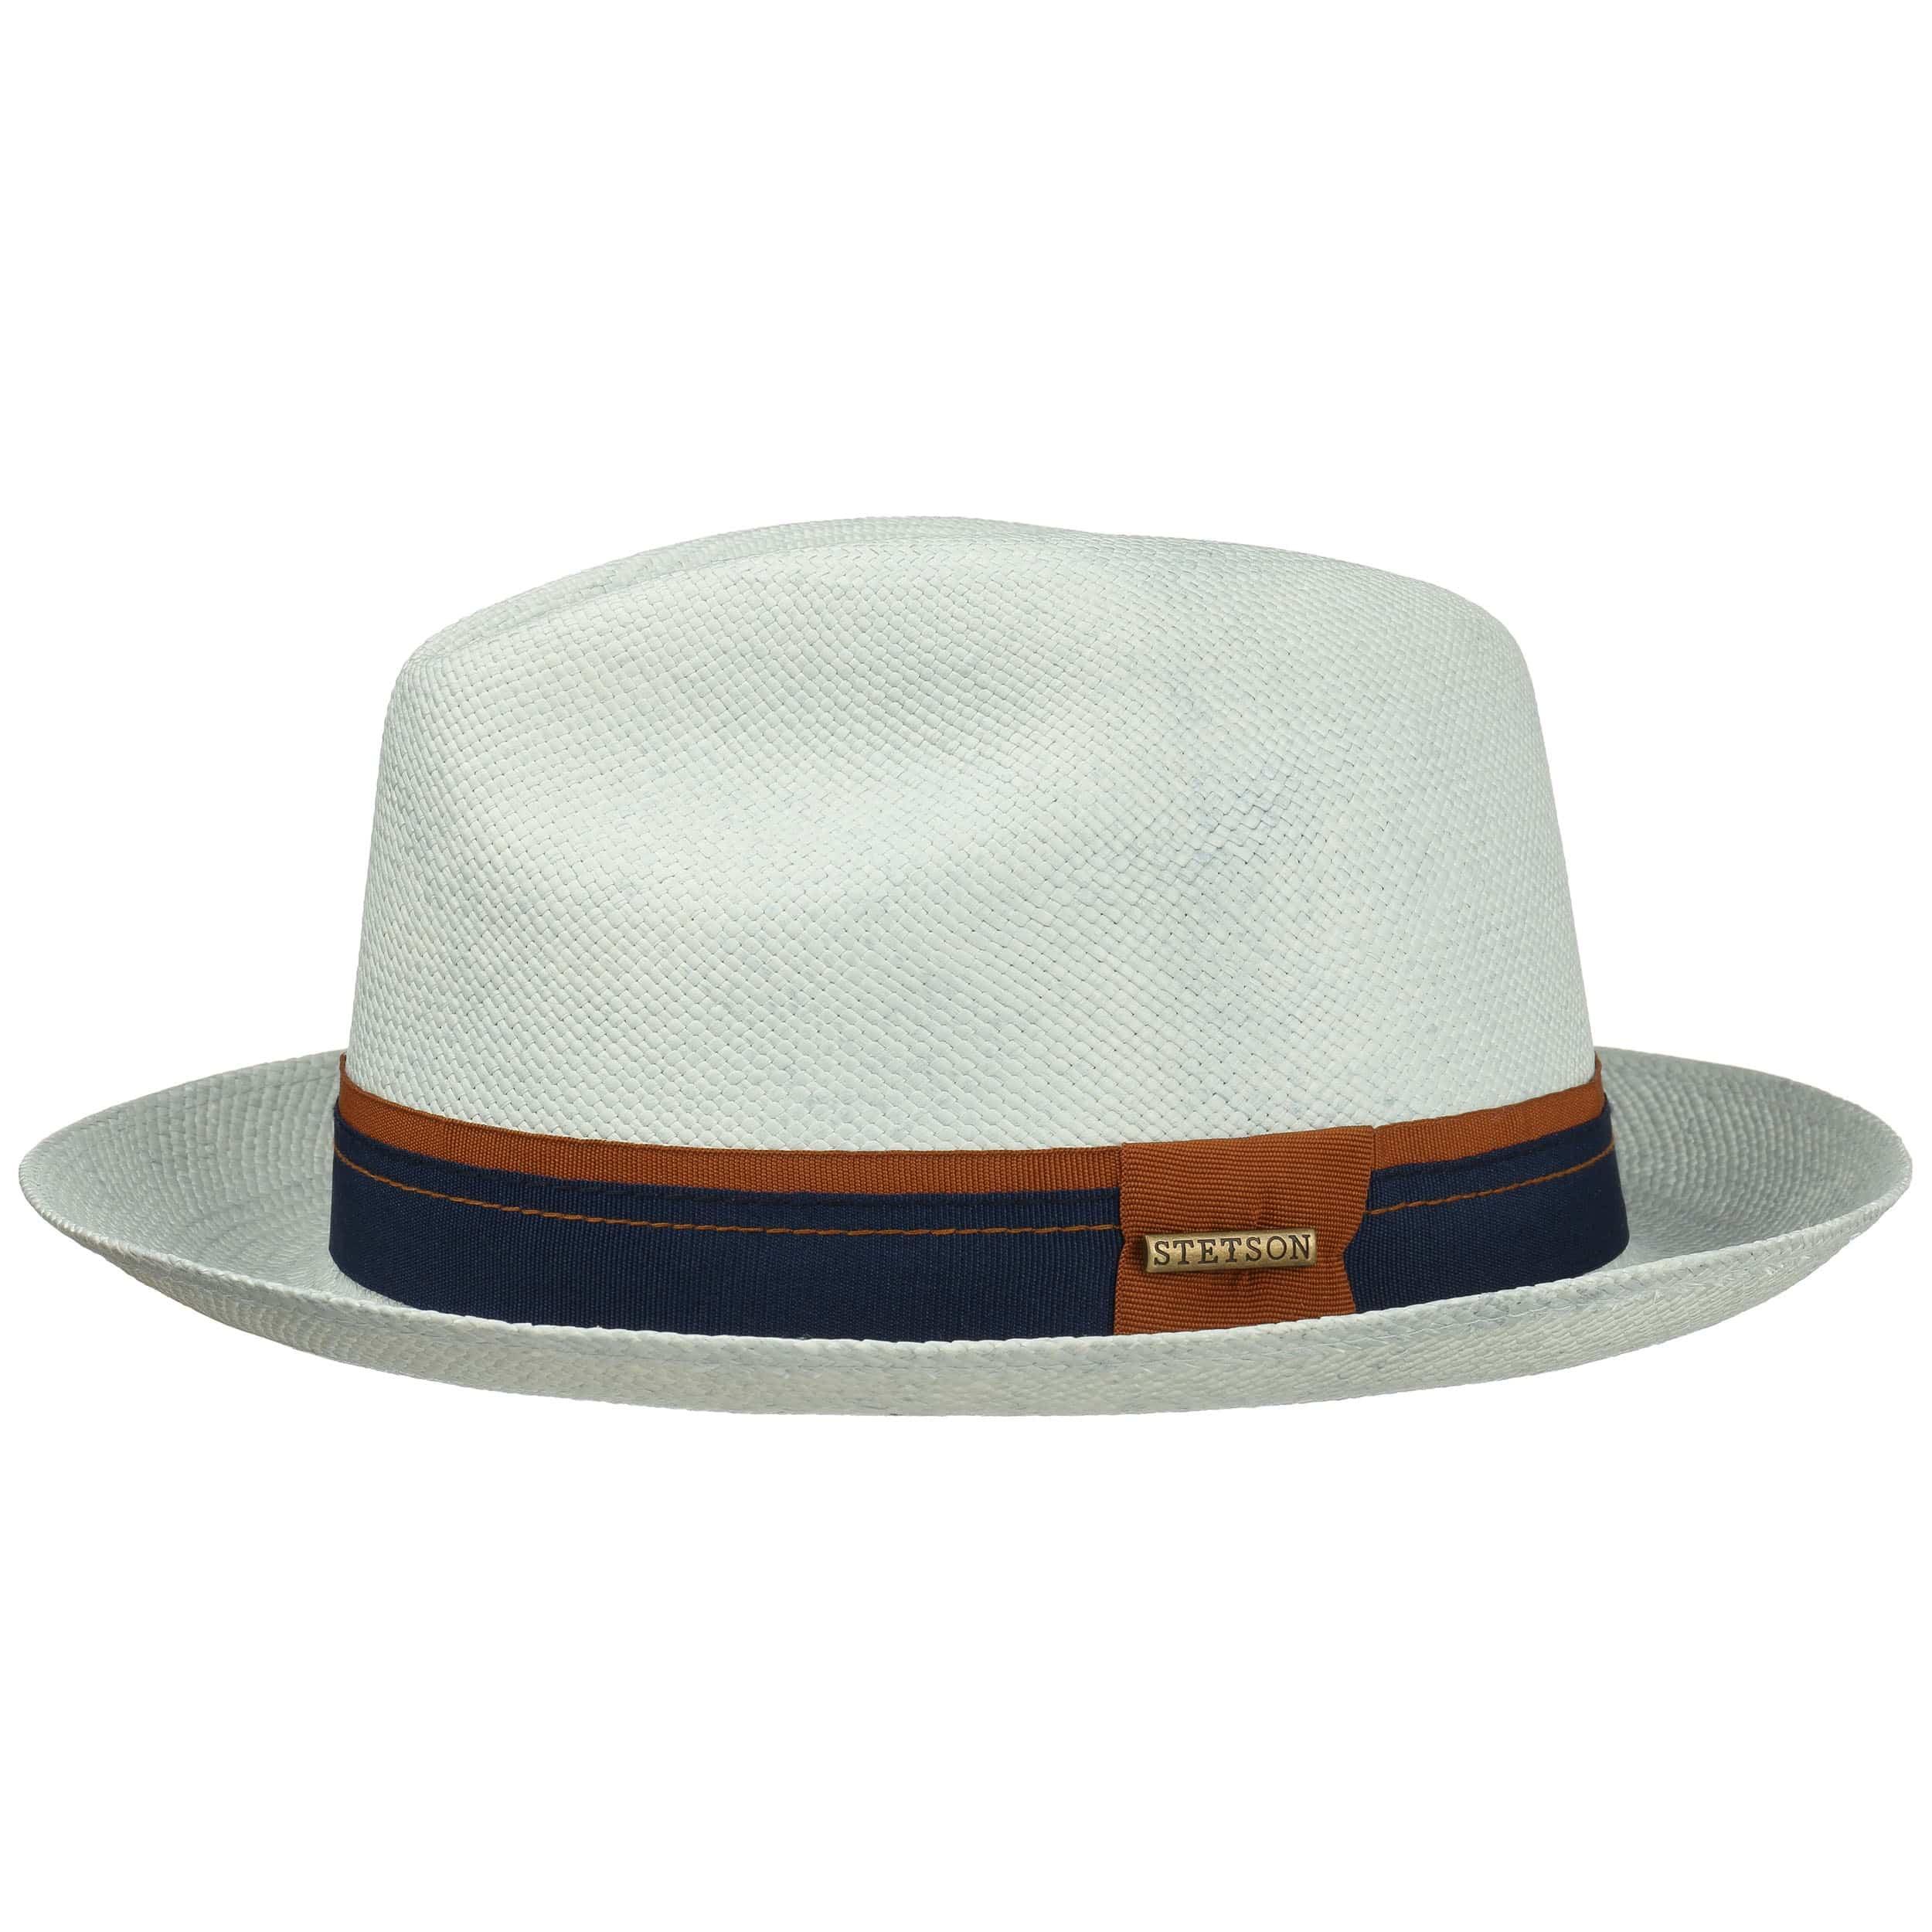 ... Sombrero Panamá Fedora 1 by Stetson - celeste 4 ... 918e49d62f6